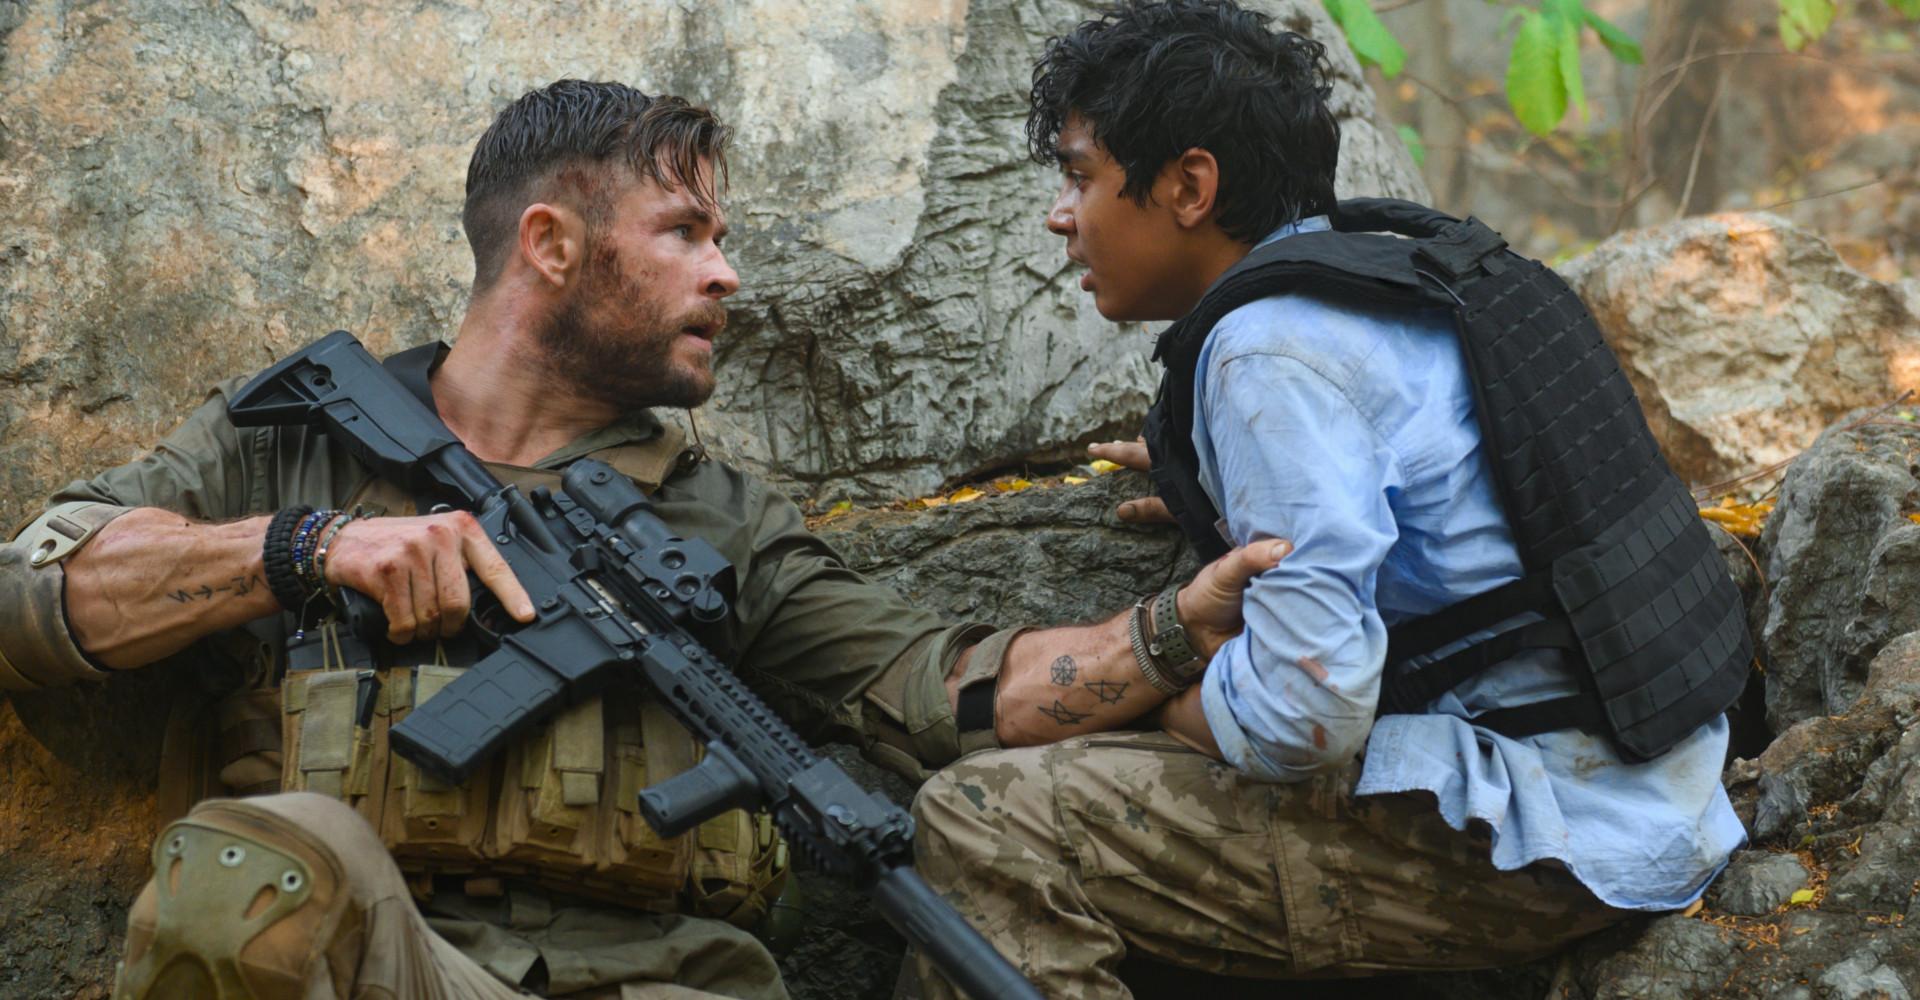 Chris Hemsworth und Rudhraksh Jaiswal in Tyler Rake: Extraction